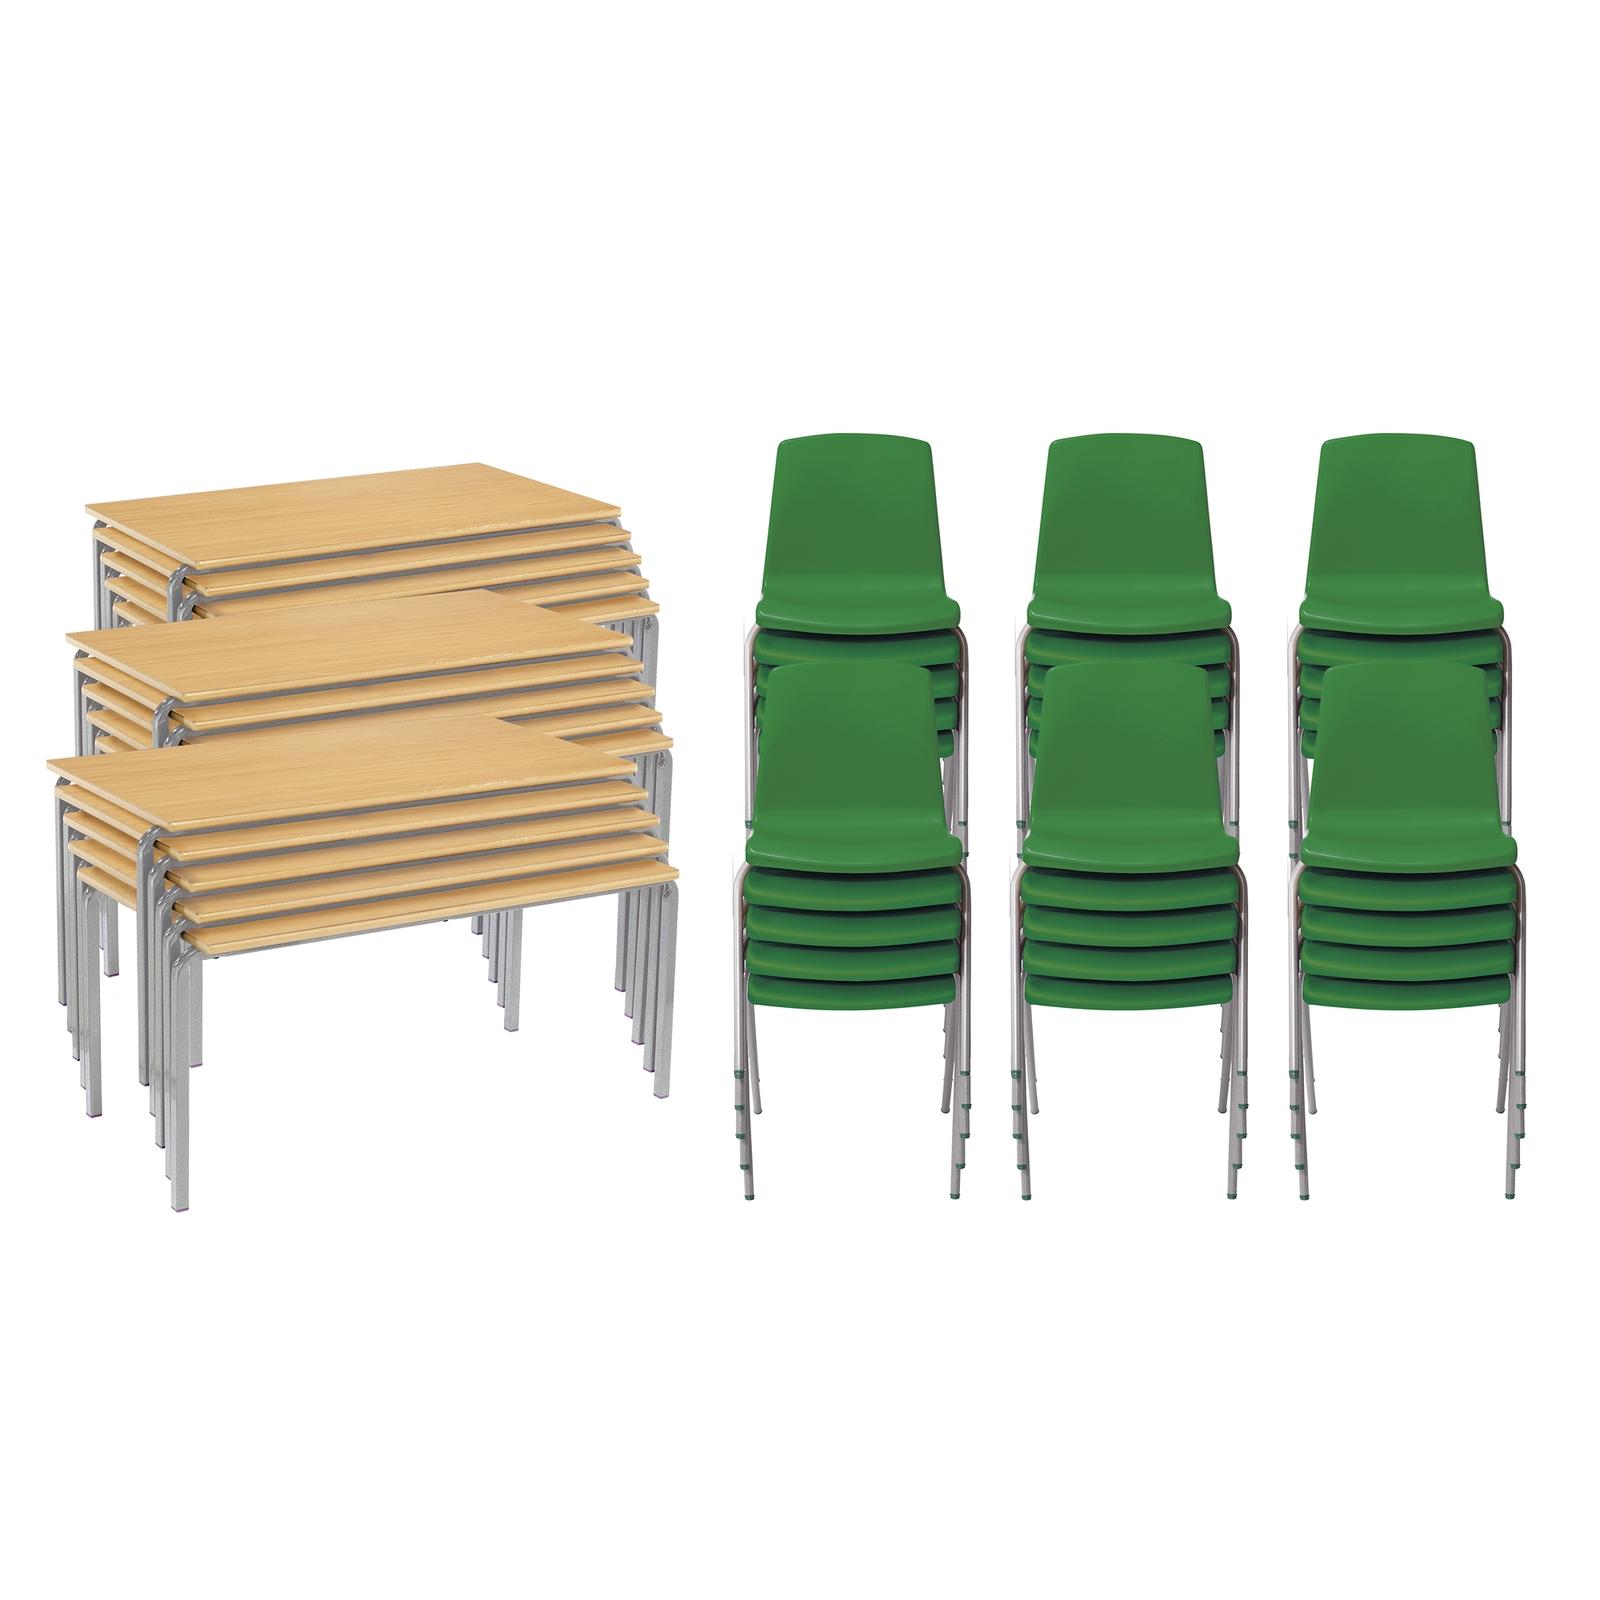 CM 15 FW Bch Tables 30 Grn Chairs 8-11yr